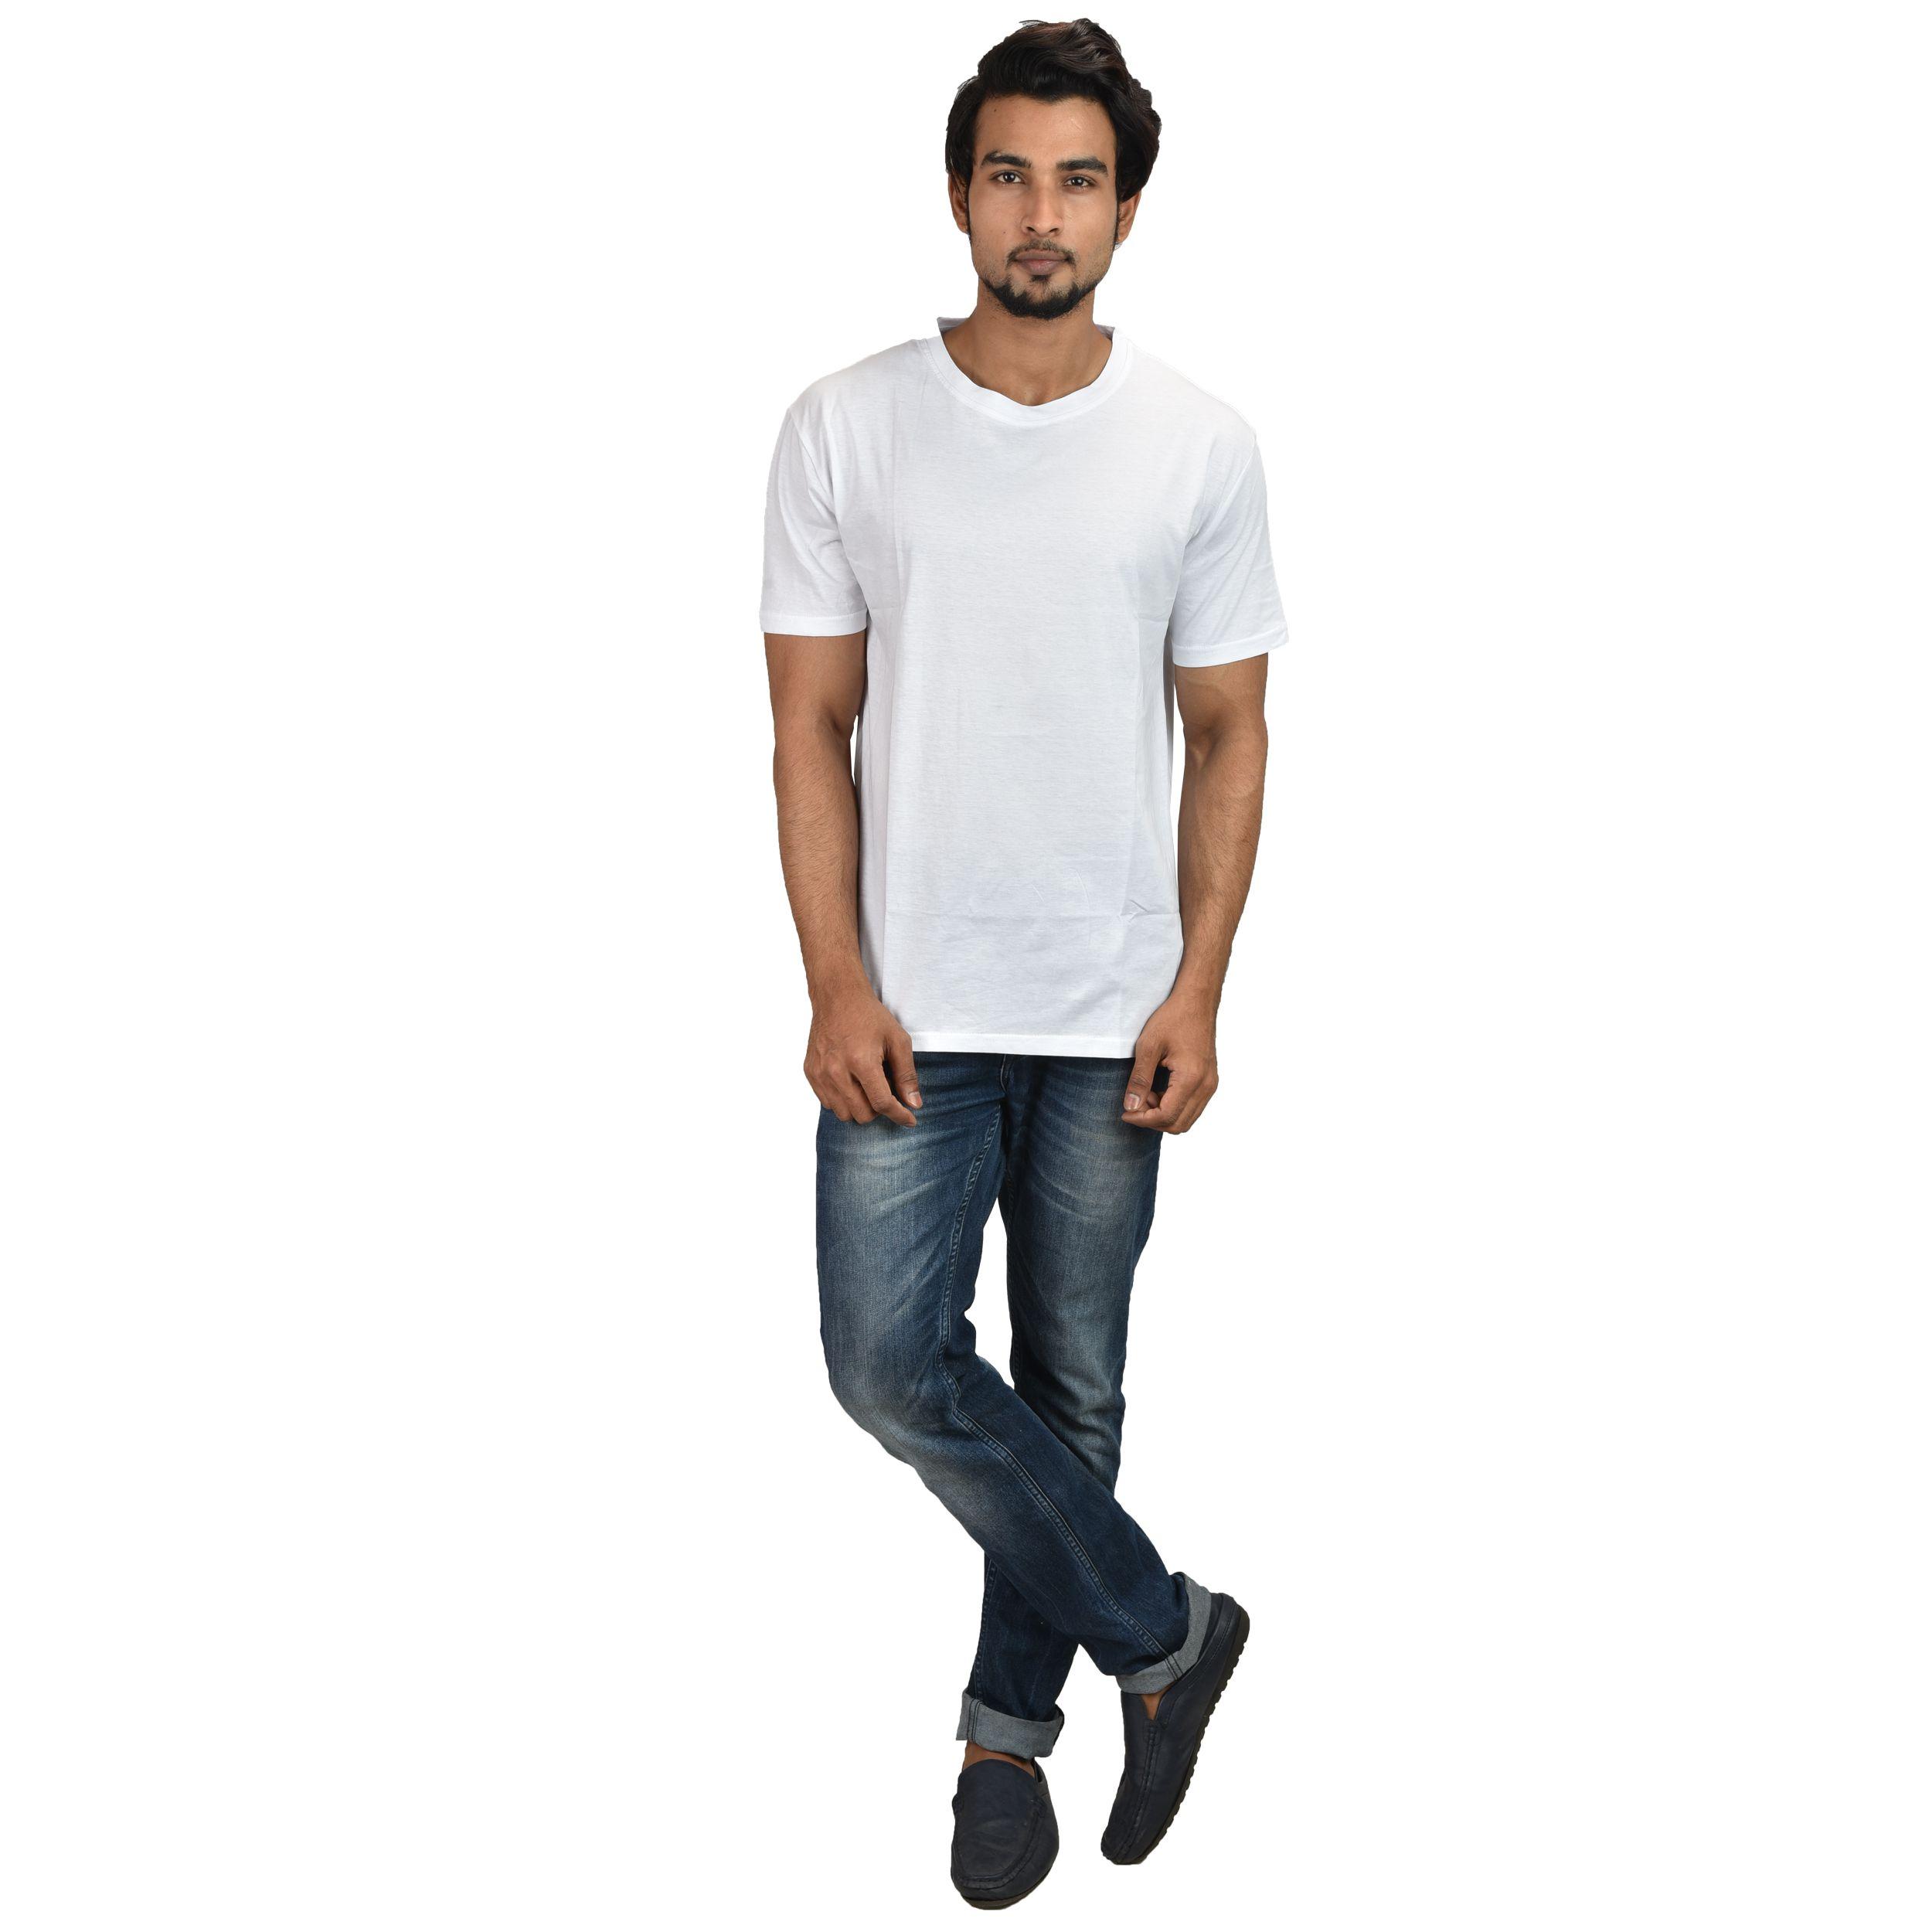 OddFashion White Cotton T-Shirt Single Pack